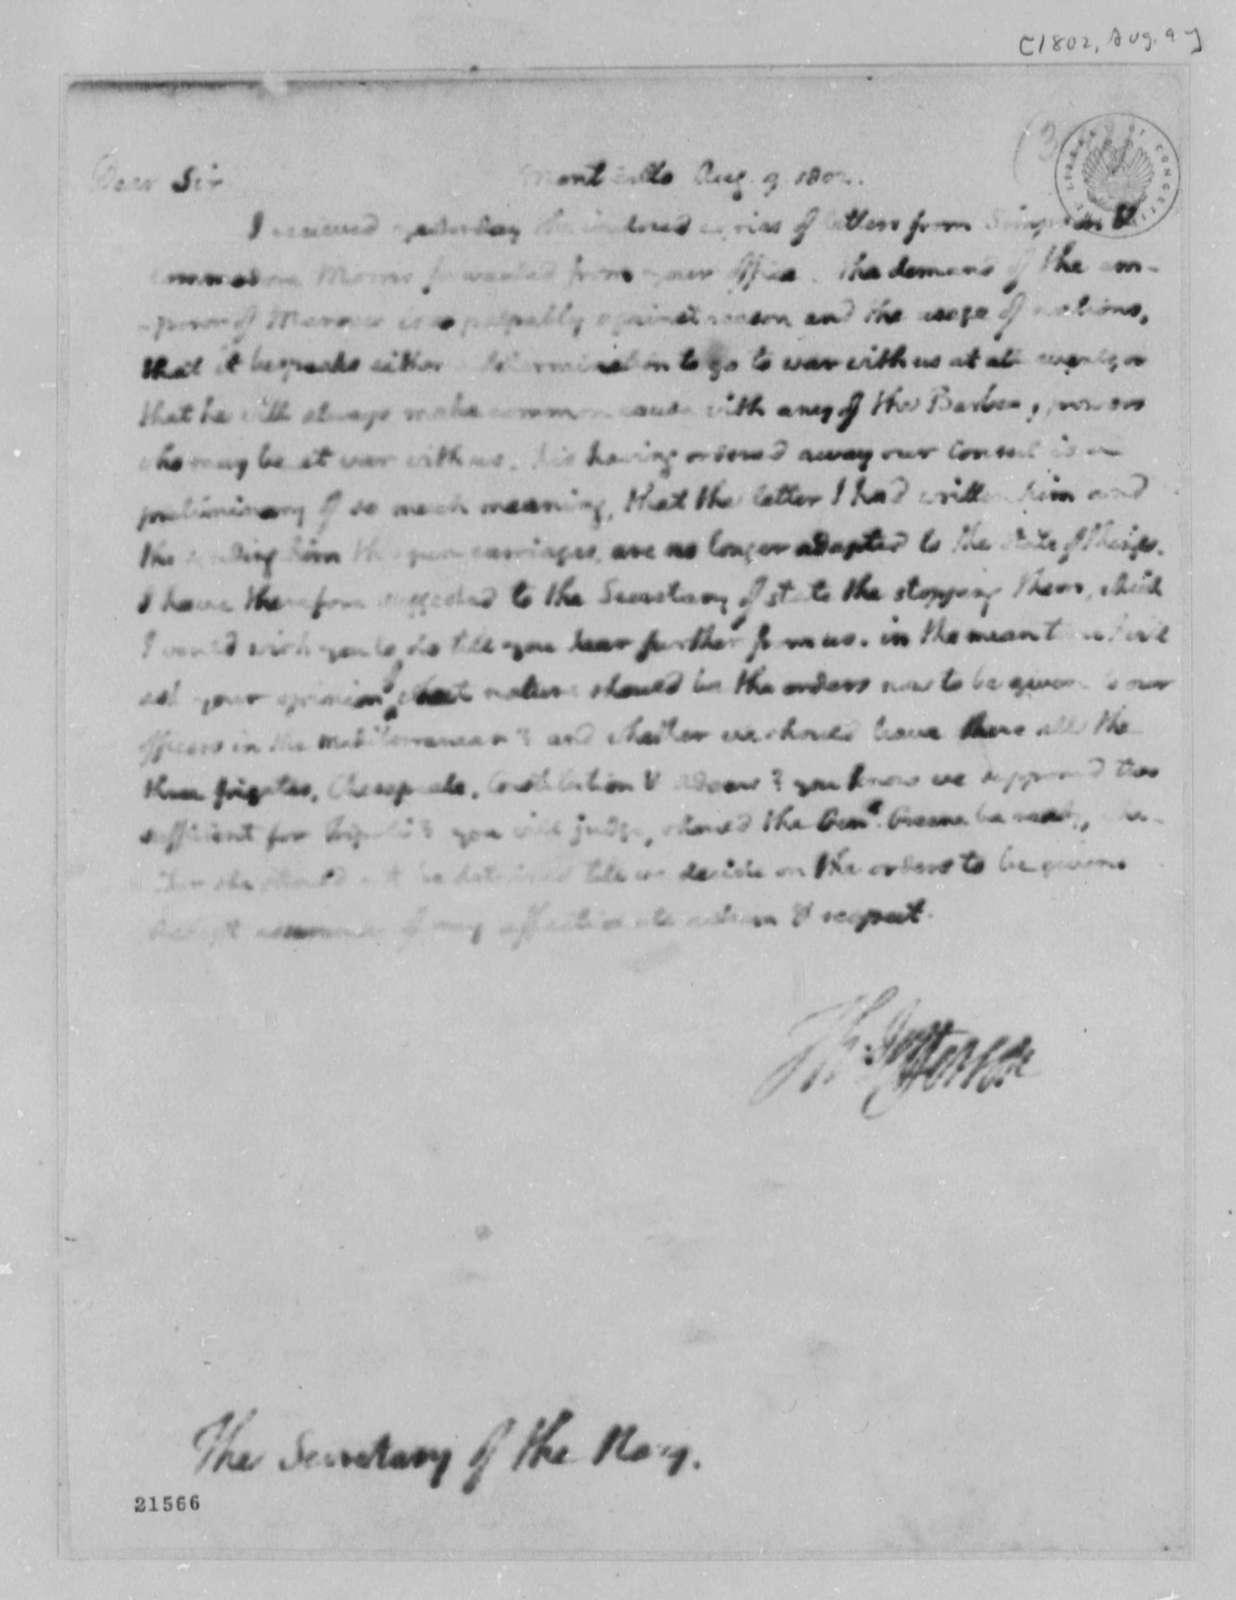 Thomas Jefferson to Benjamin Stoddert, August 9, 1802